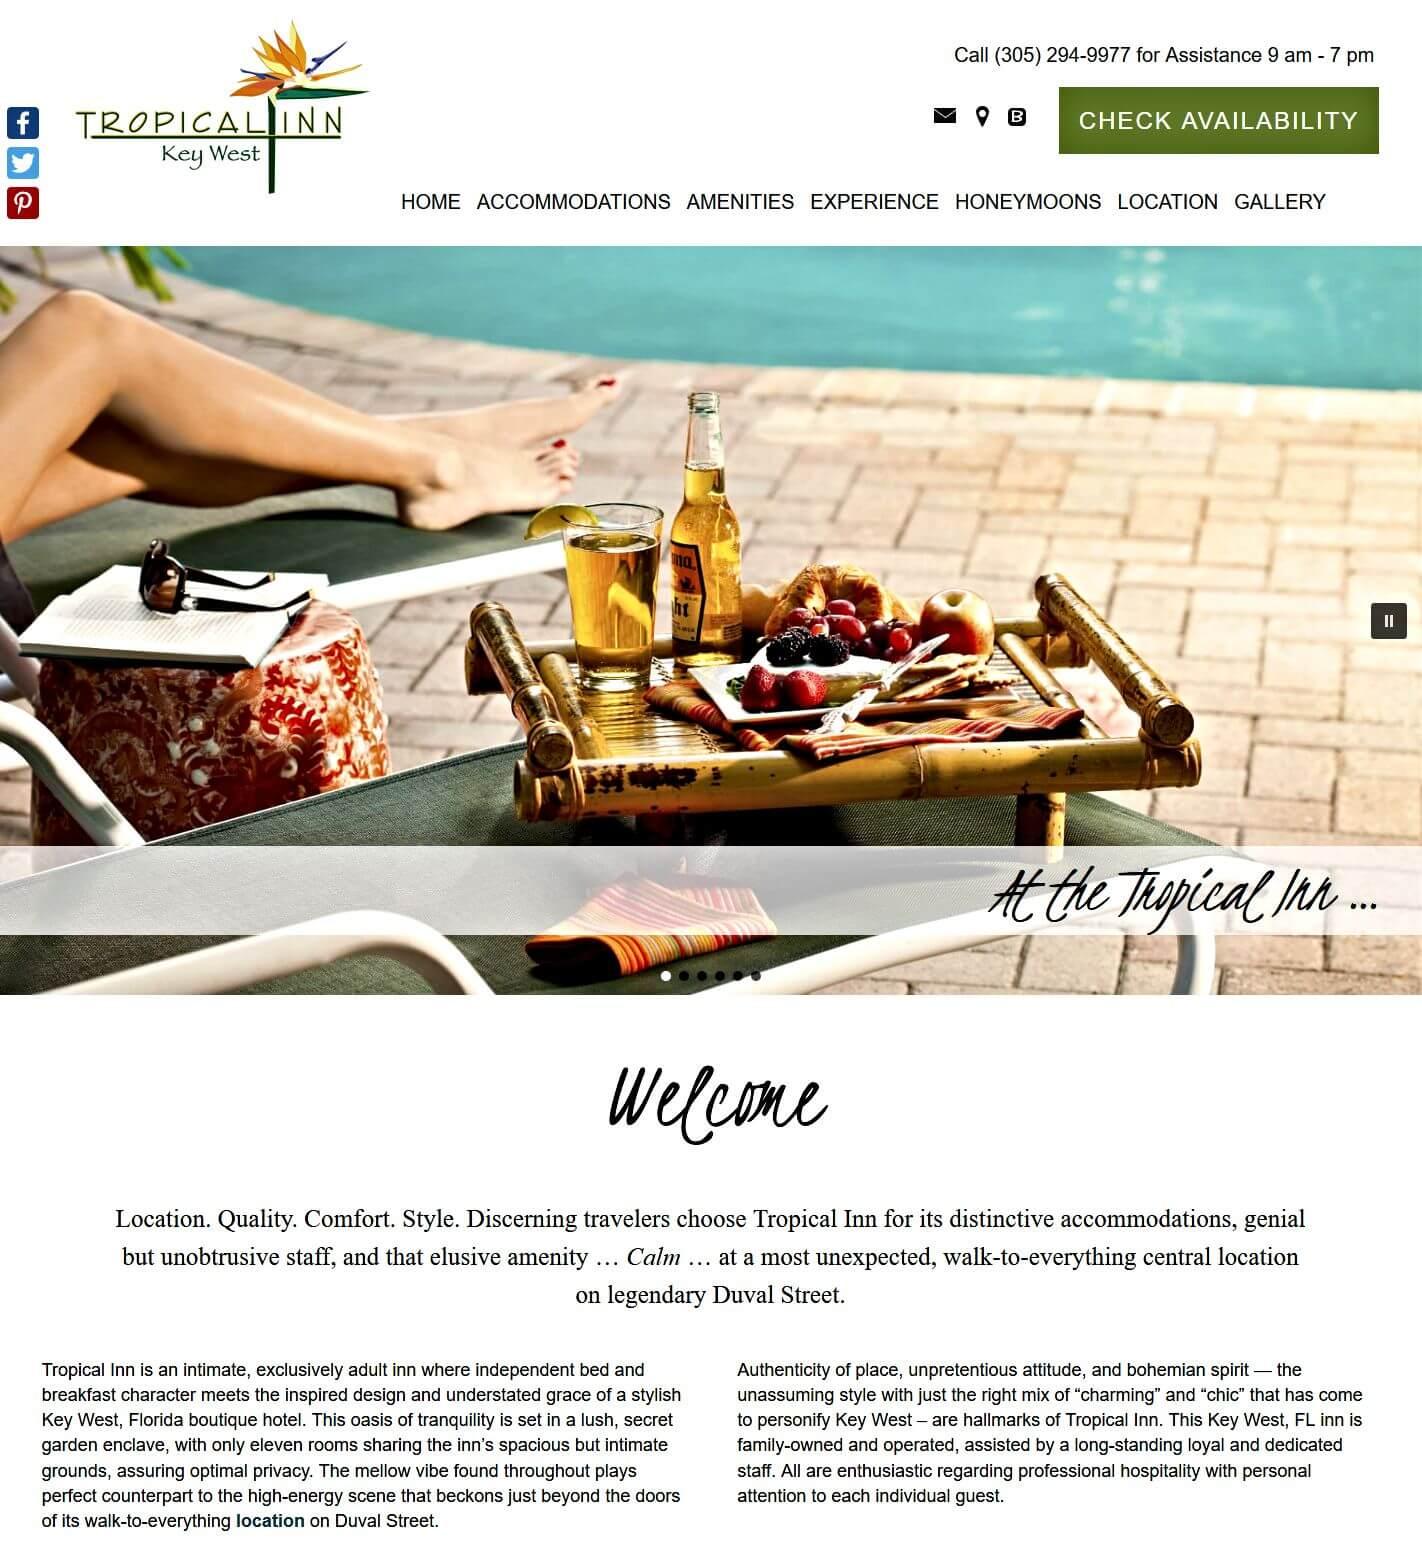 Tropical Inn homepage screencap